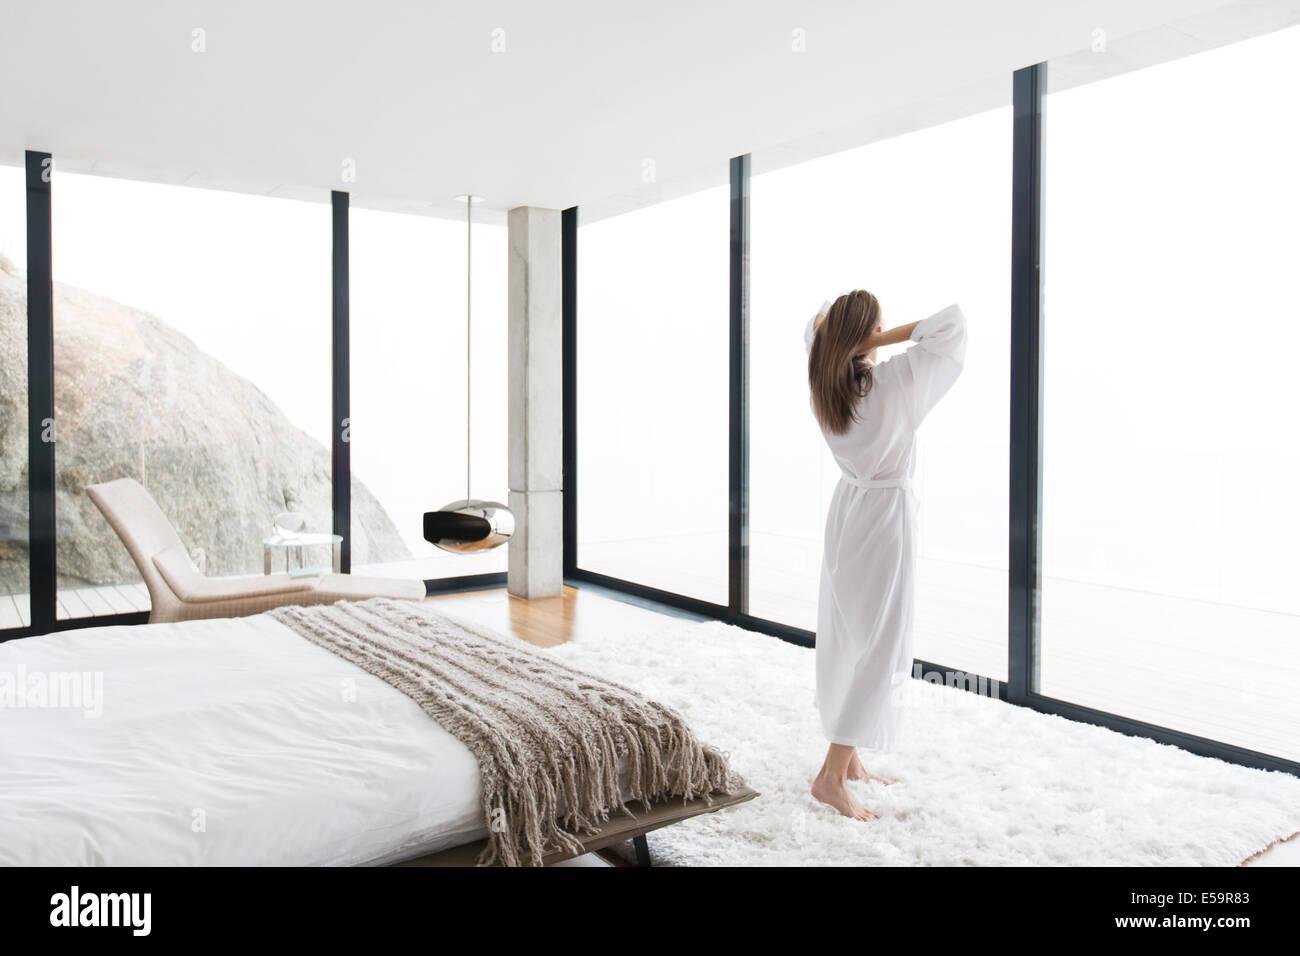 Woman wearing bathrobe in modern bedroom - Stock Image